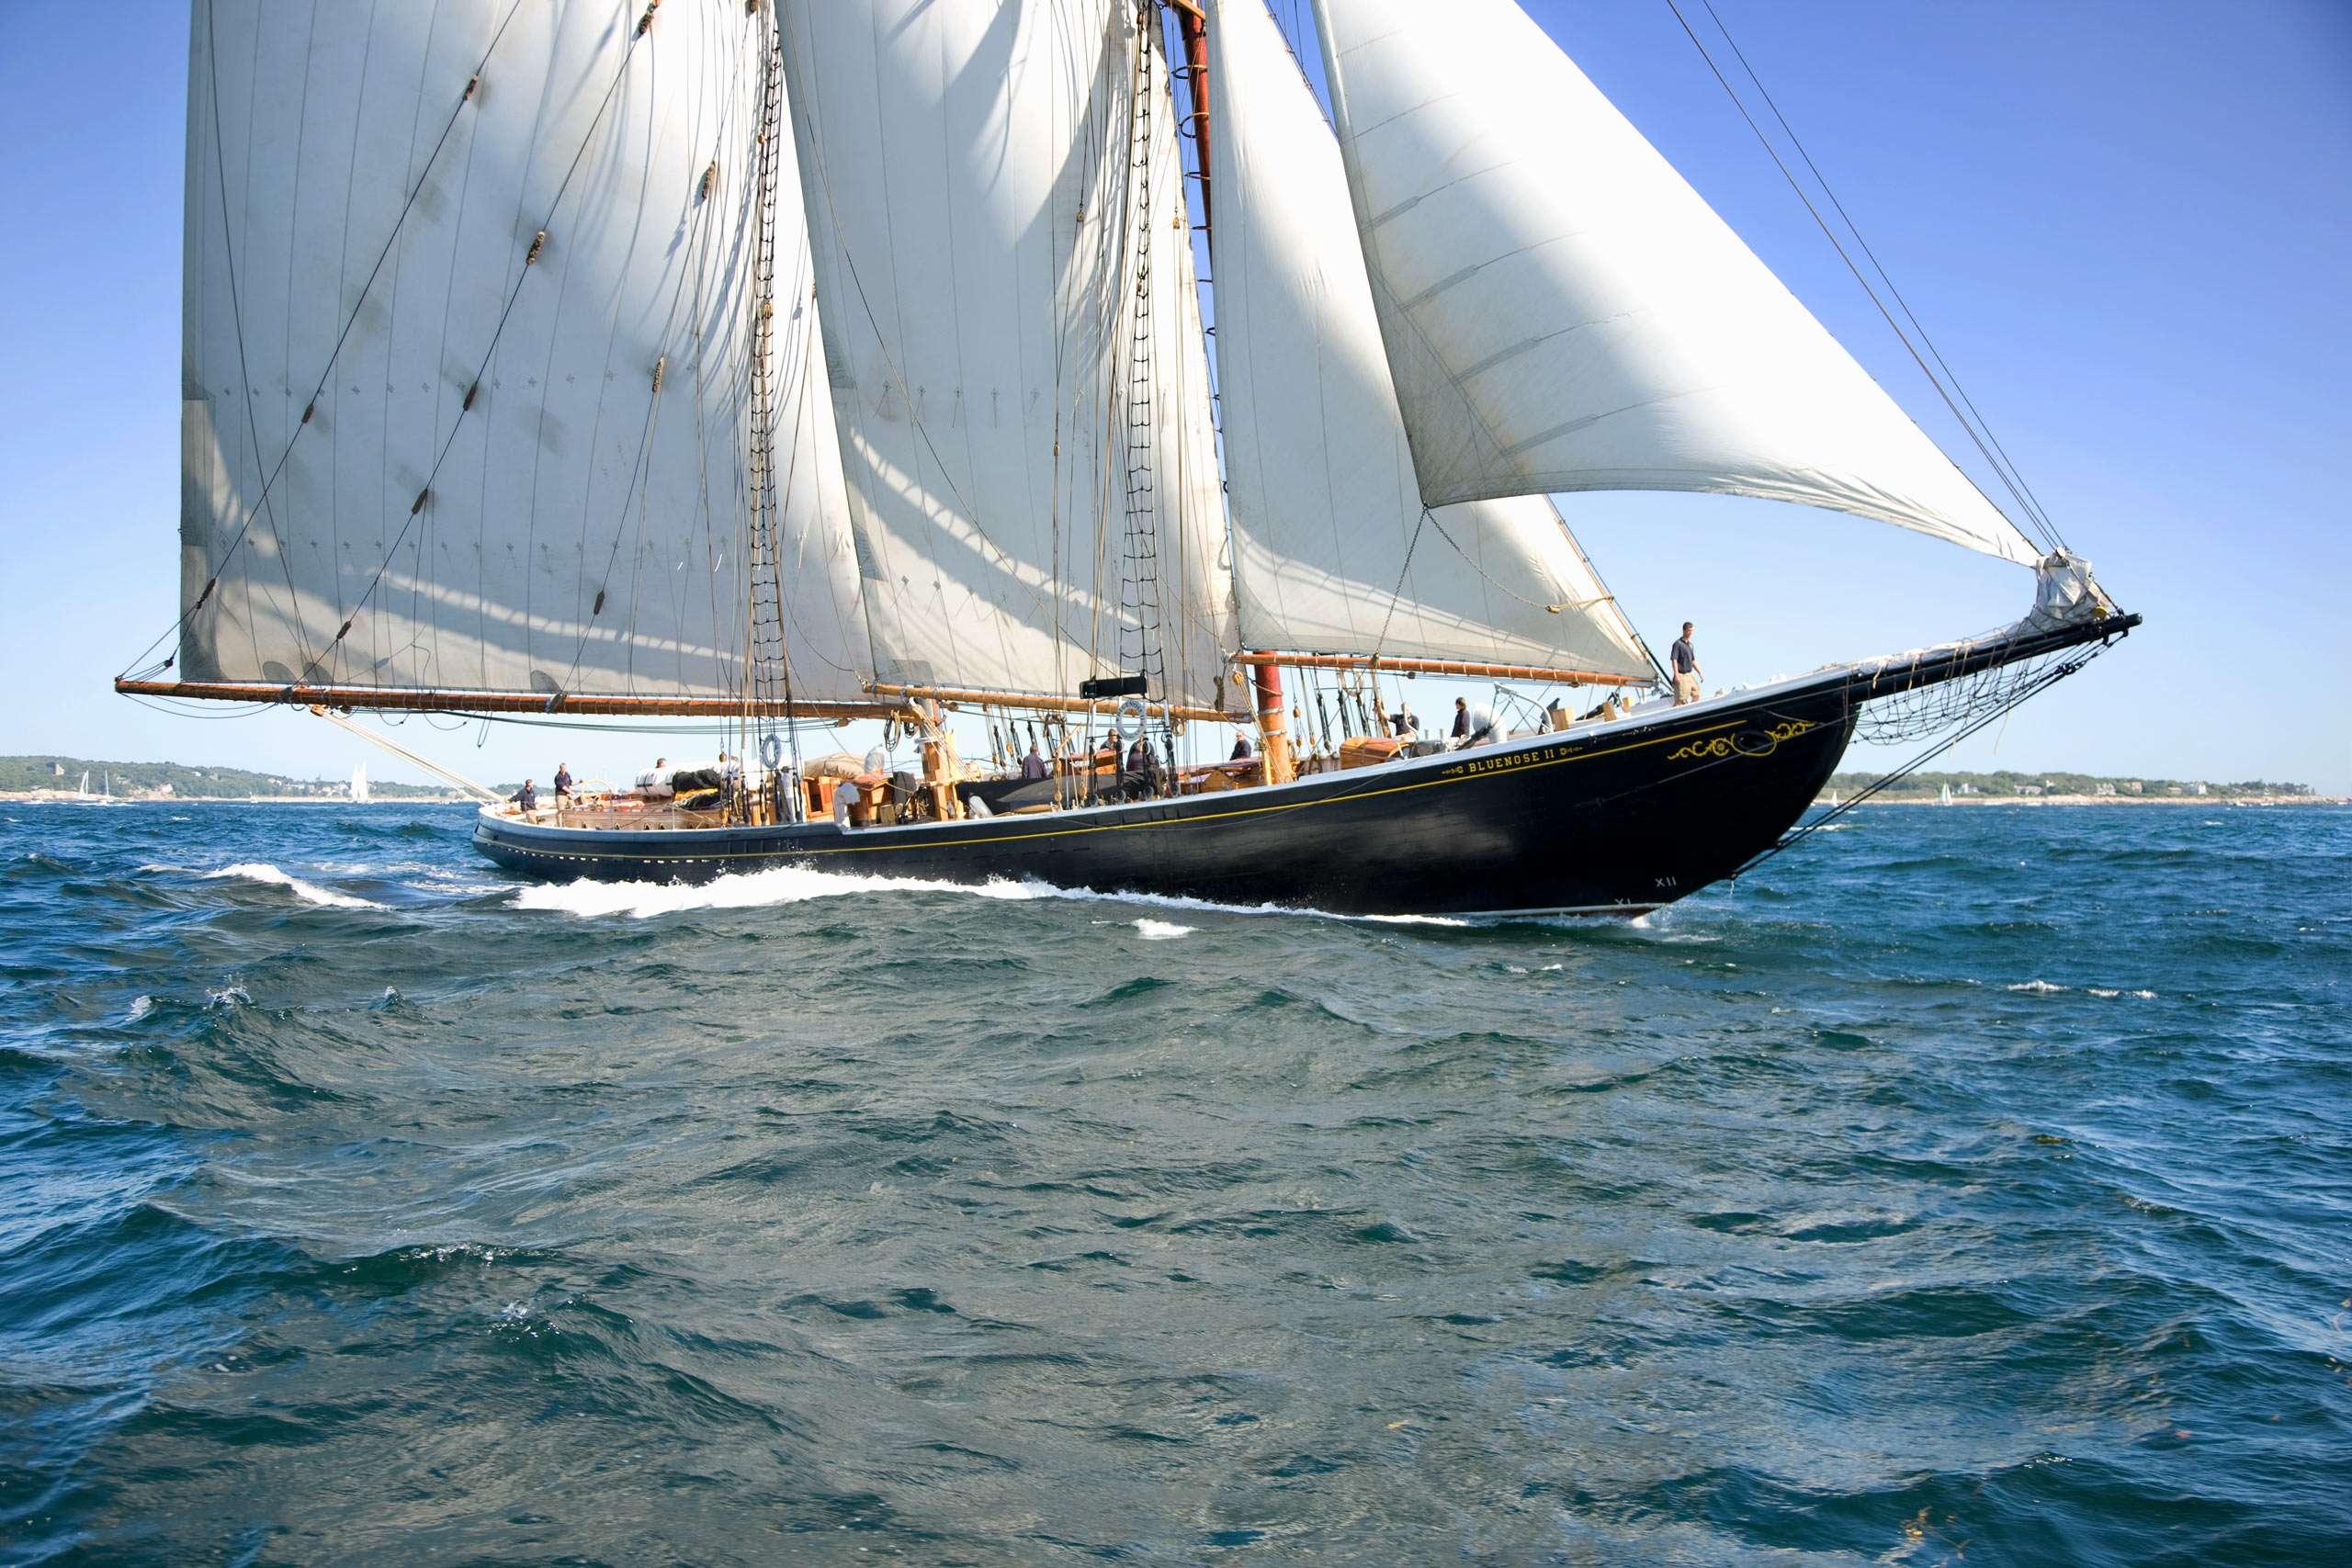 PORTFOLIO - Sailing - Windjammers #11   PCG443